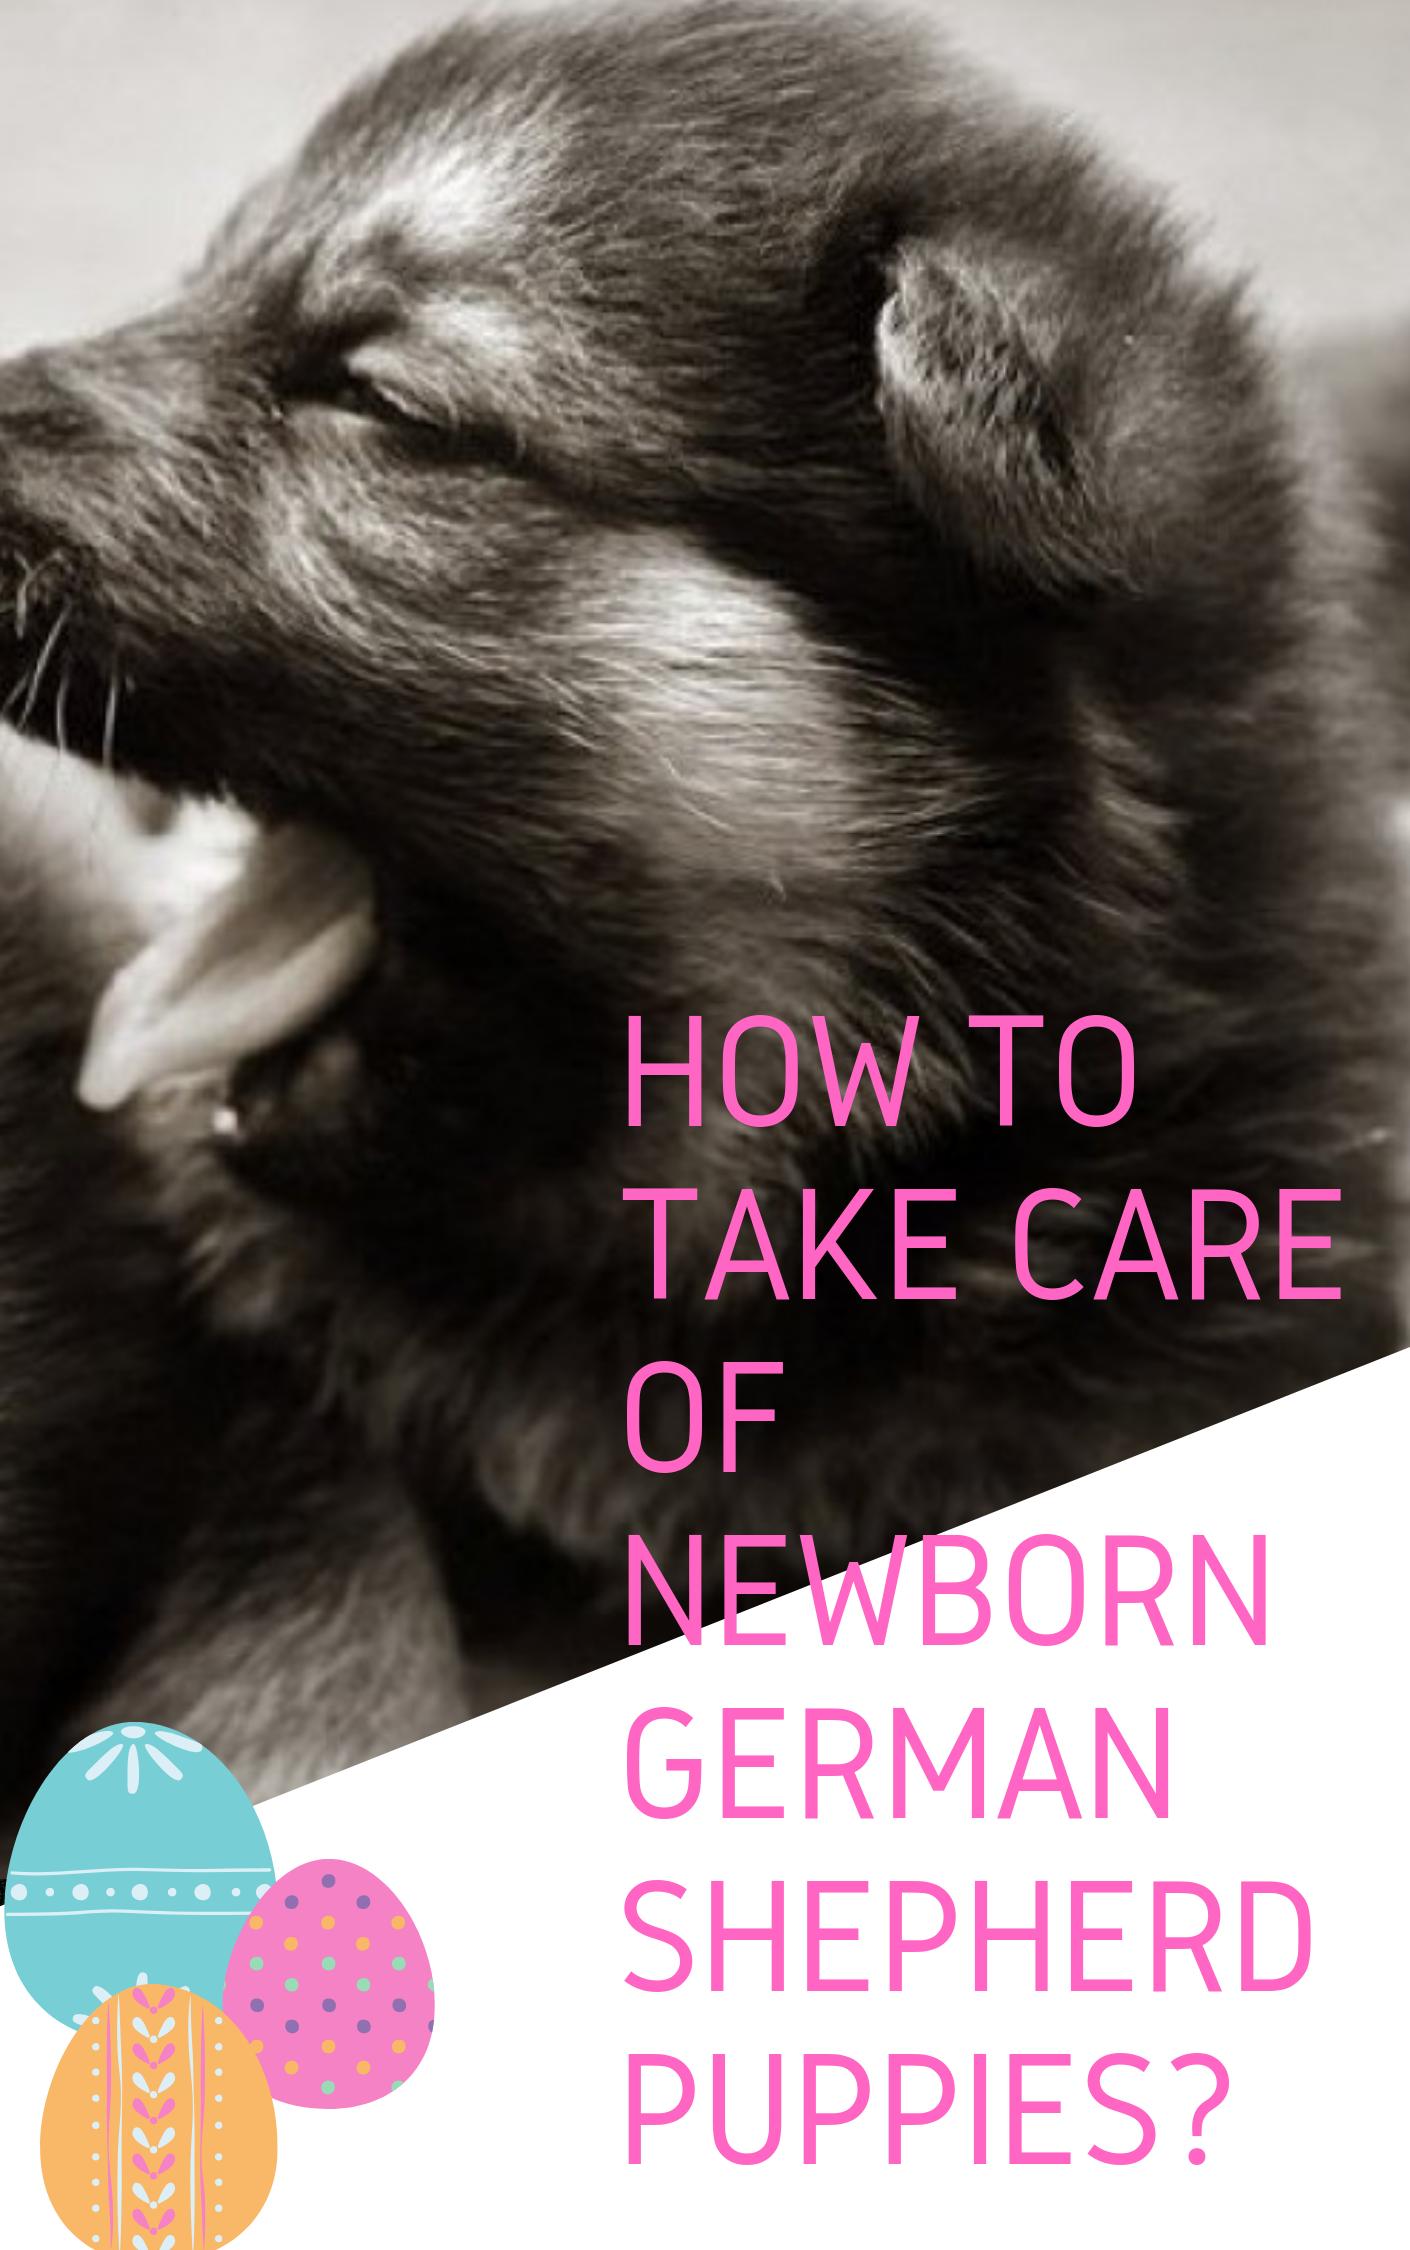 How To Take Care Of Newborn German Shepherd Puppies Gshepherds German Shepherd Puppies Shepherd Puppies German Shepherd Training